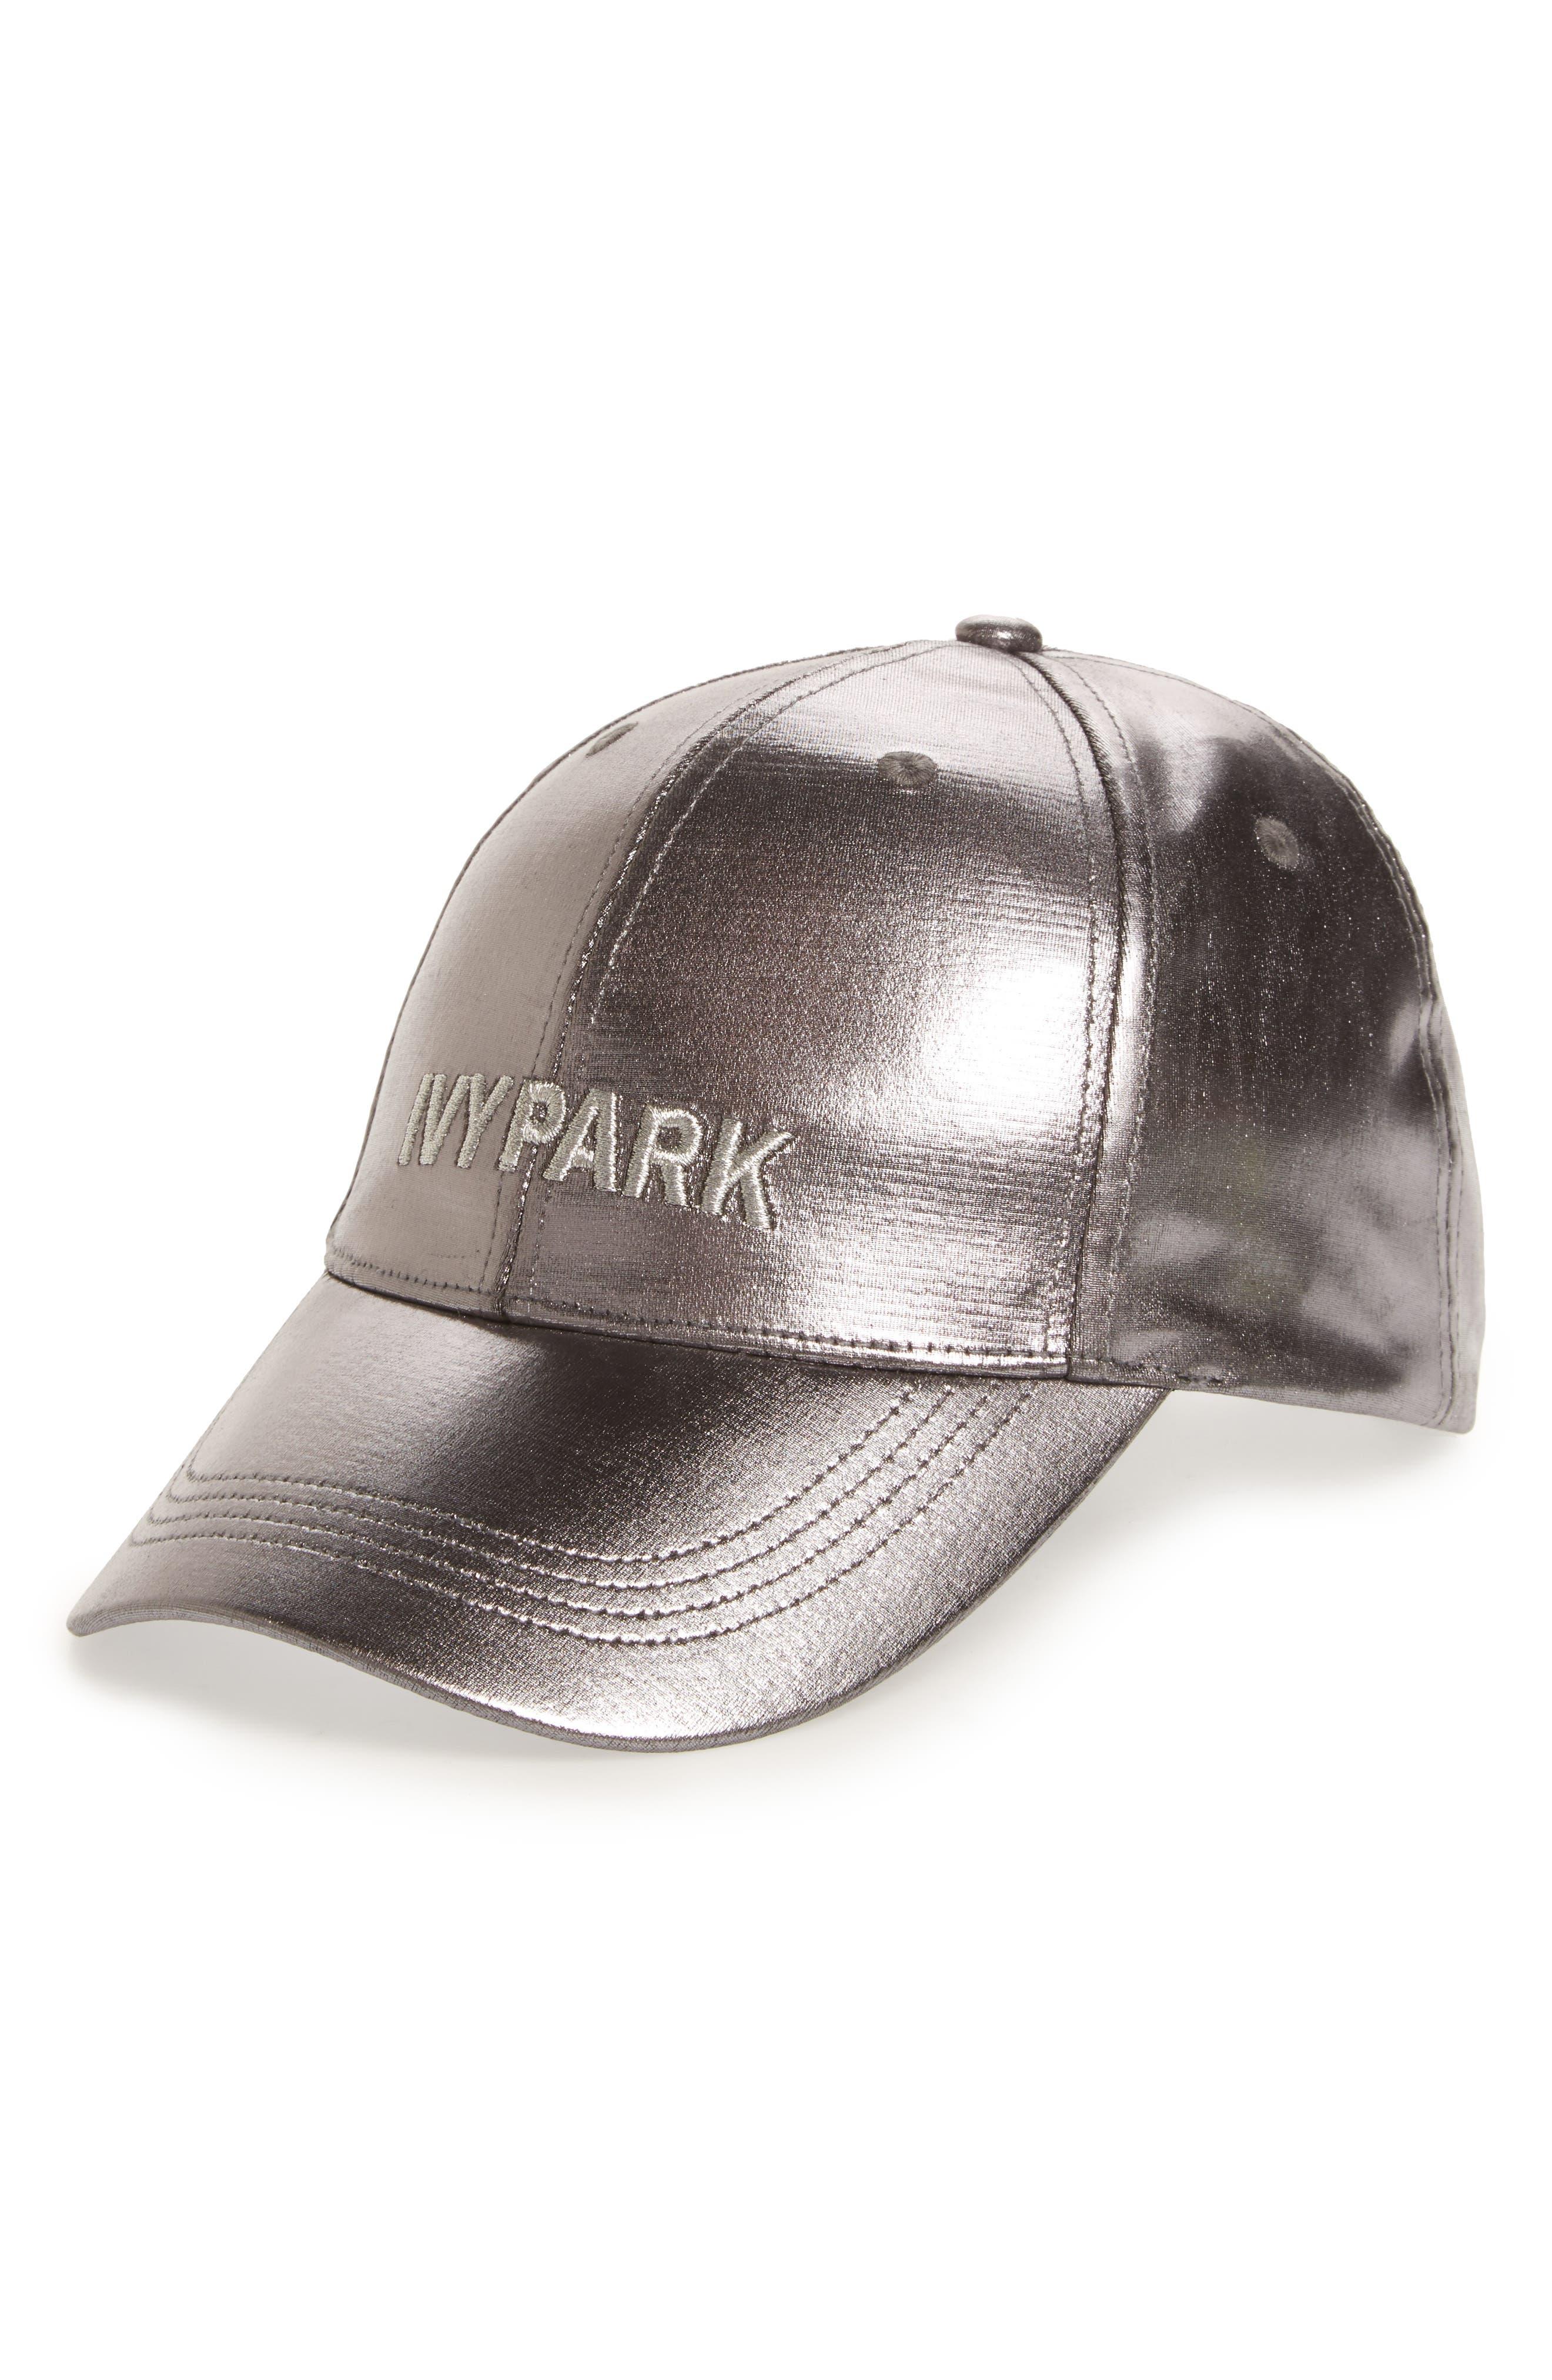 IVY PARK® Adjustable Metallic Baseball Cap